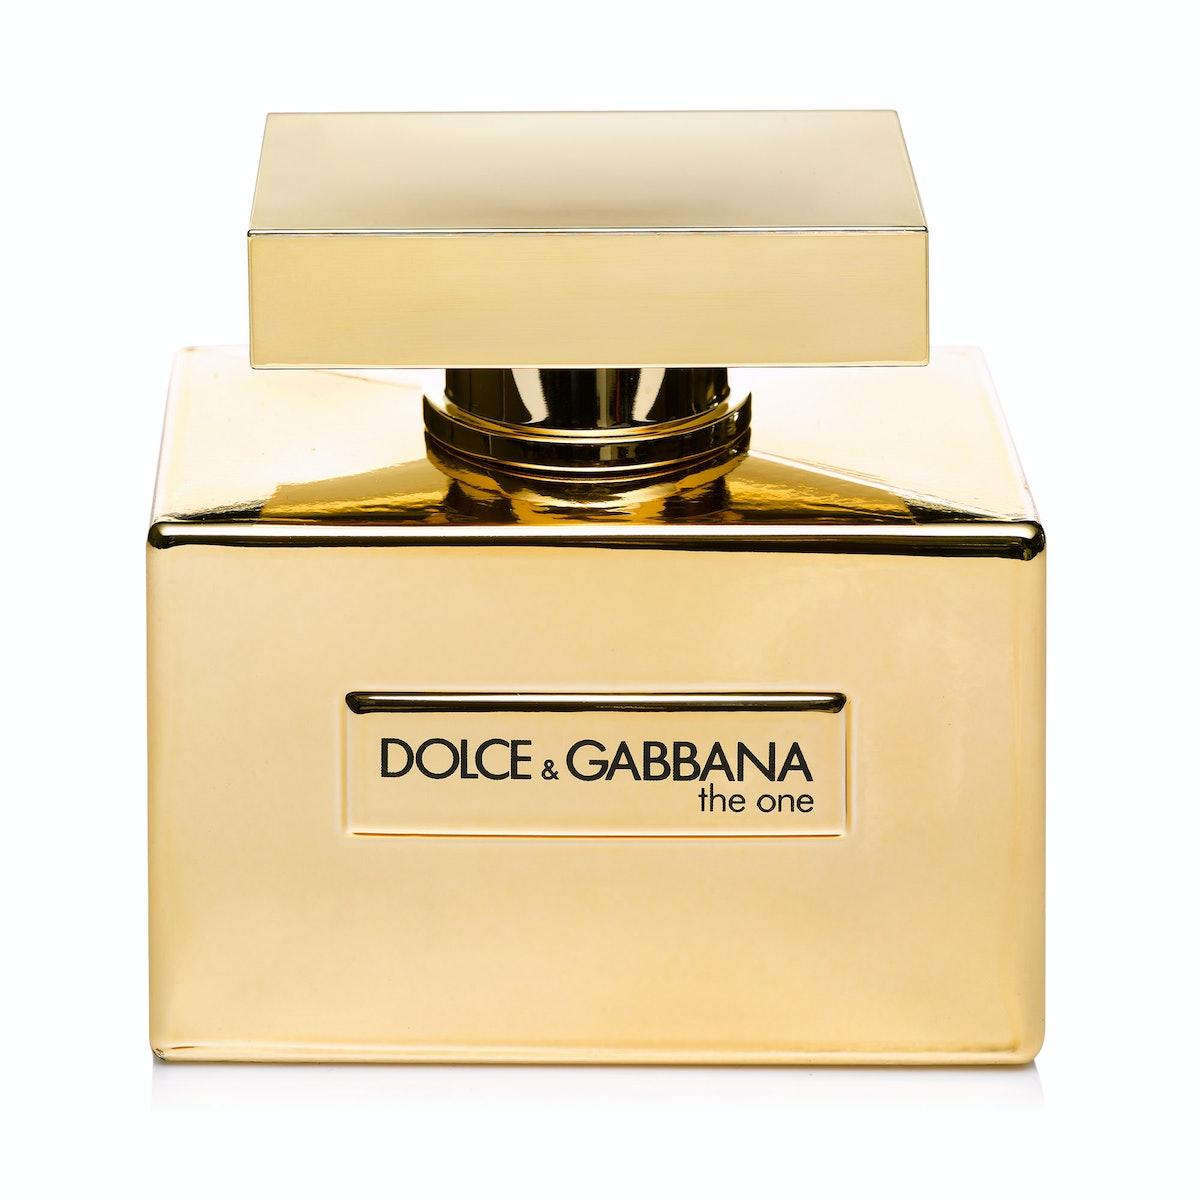 Dolce & Gabbana the One for Women 2014 limited edition eau de parfum, $108, [nordstrom.com](http://rstyle.me/n/drj9z3w3n).